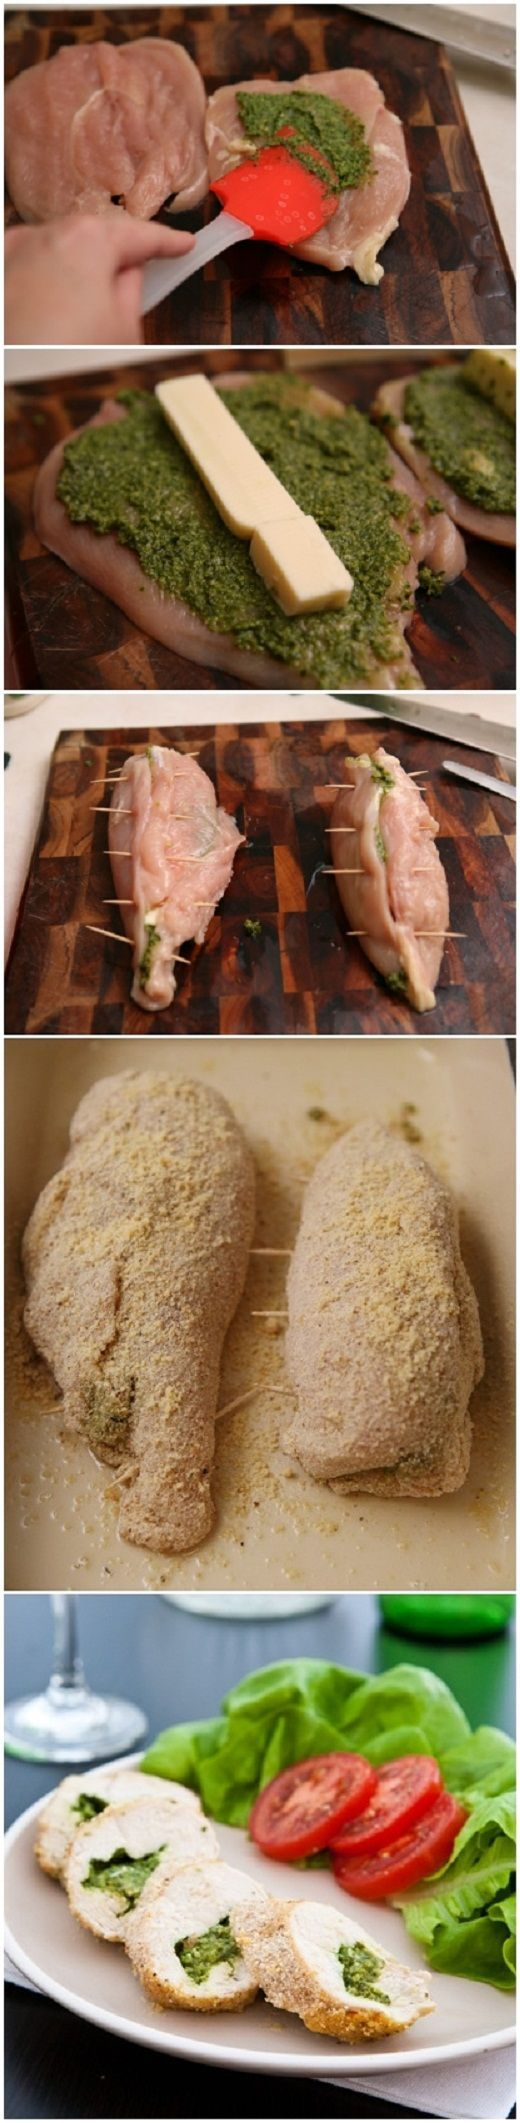 Mozzarella-Pesto Stuffed Chicken Breasts. This sounds amazing..